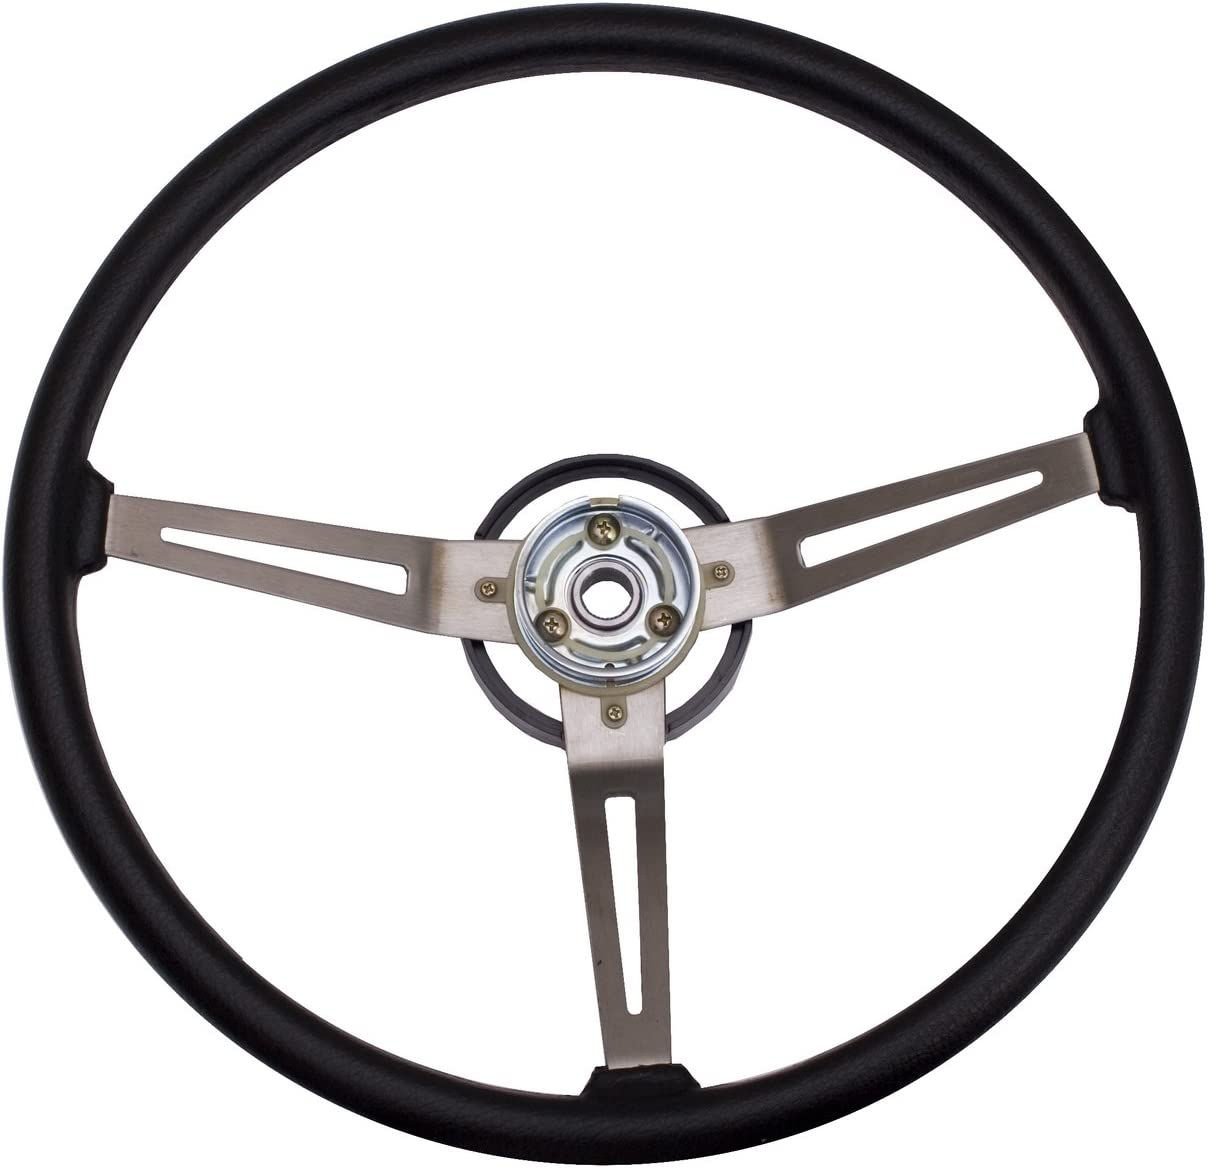 Omix-Ada 18018.05 Power Steering Coupling